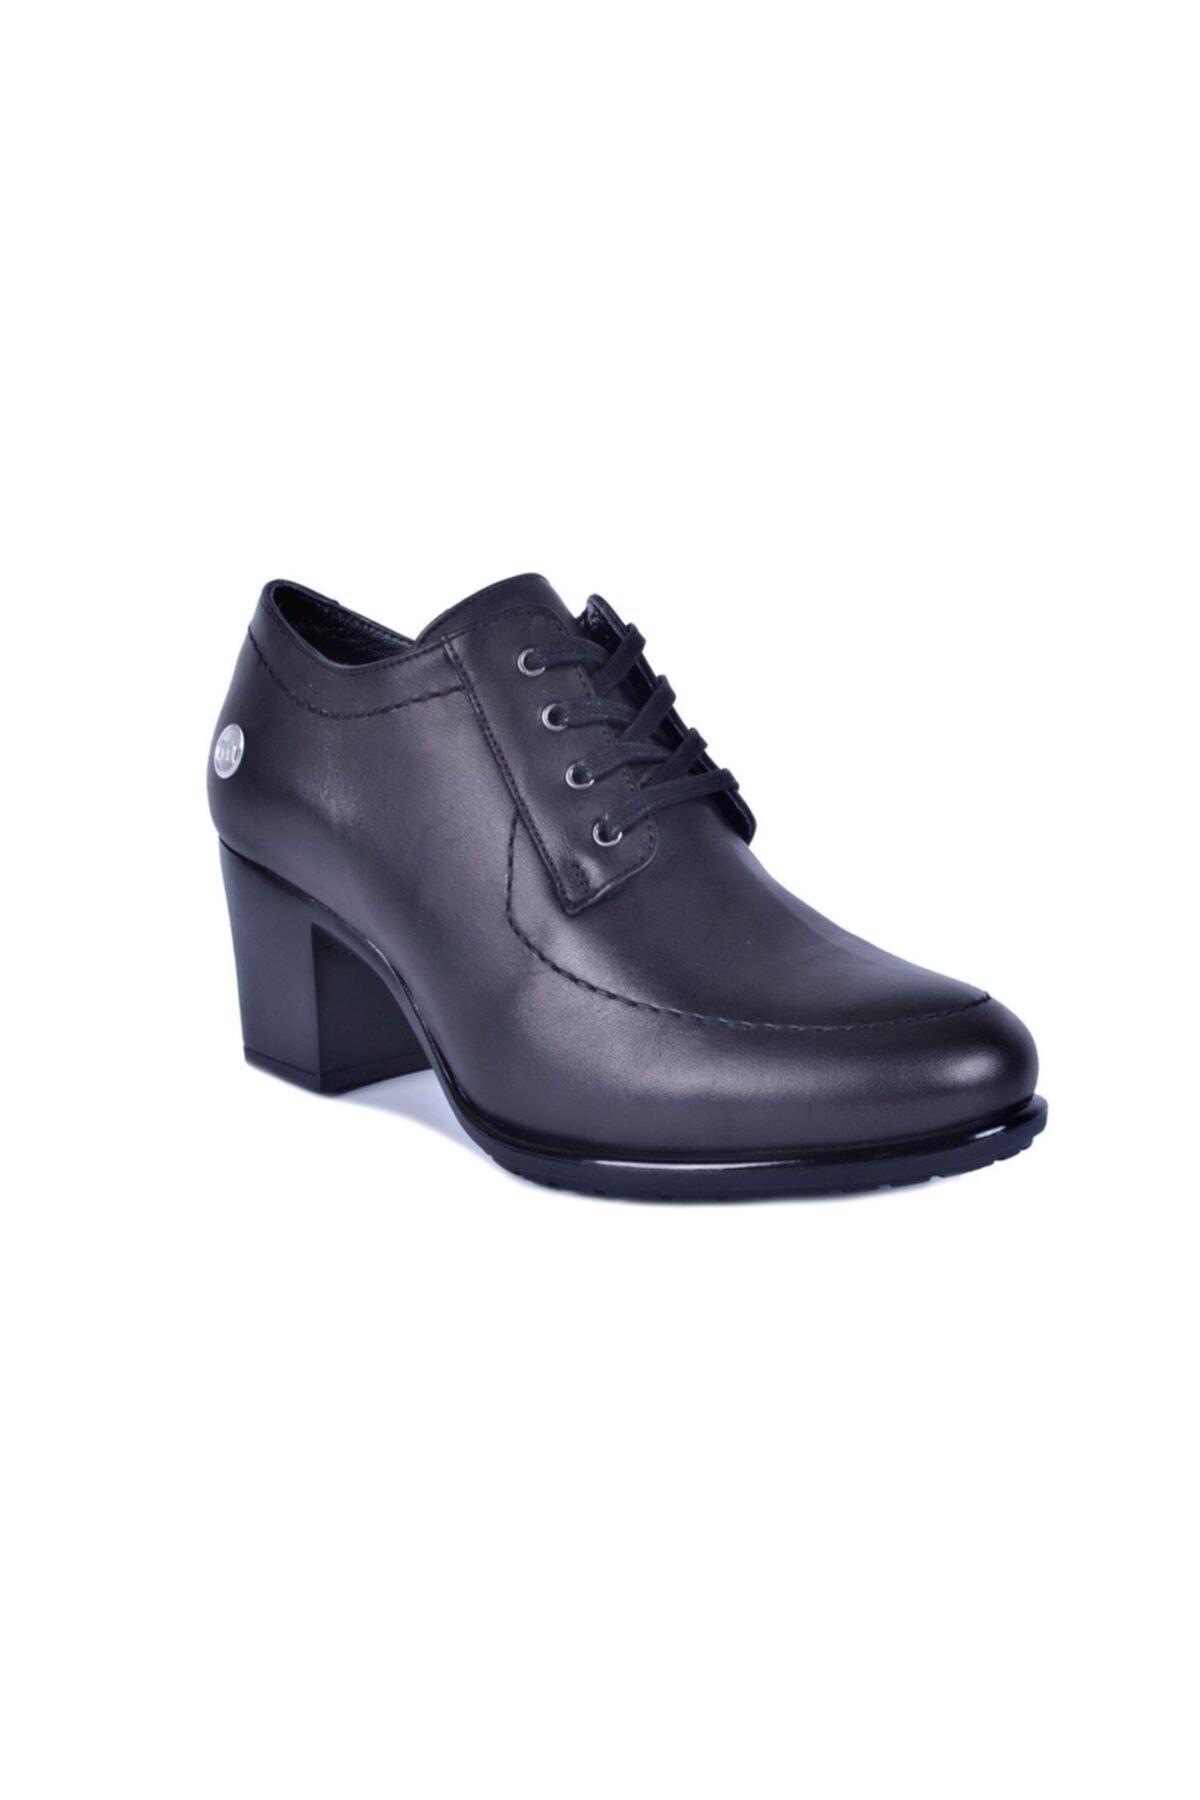 Mammamia Siyah Kadın Topuklu Deri Ayakkabı 740 2